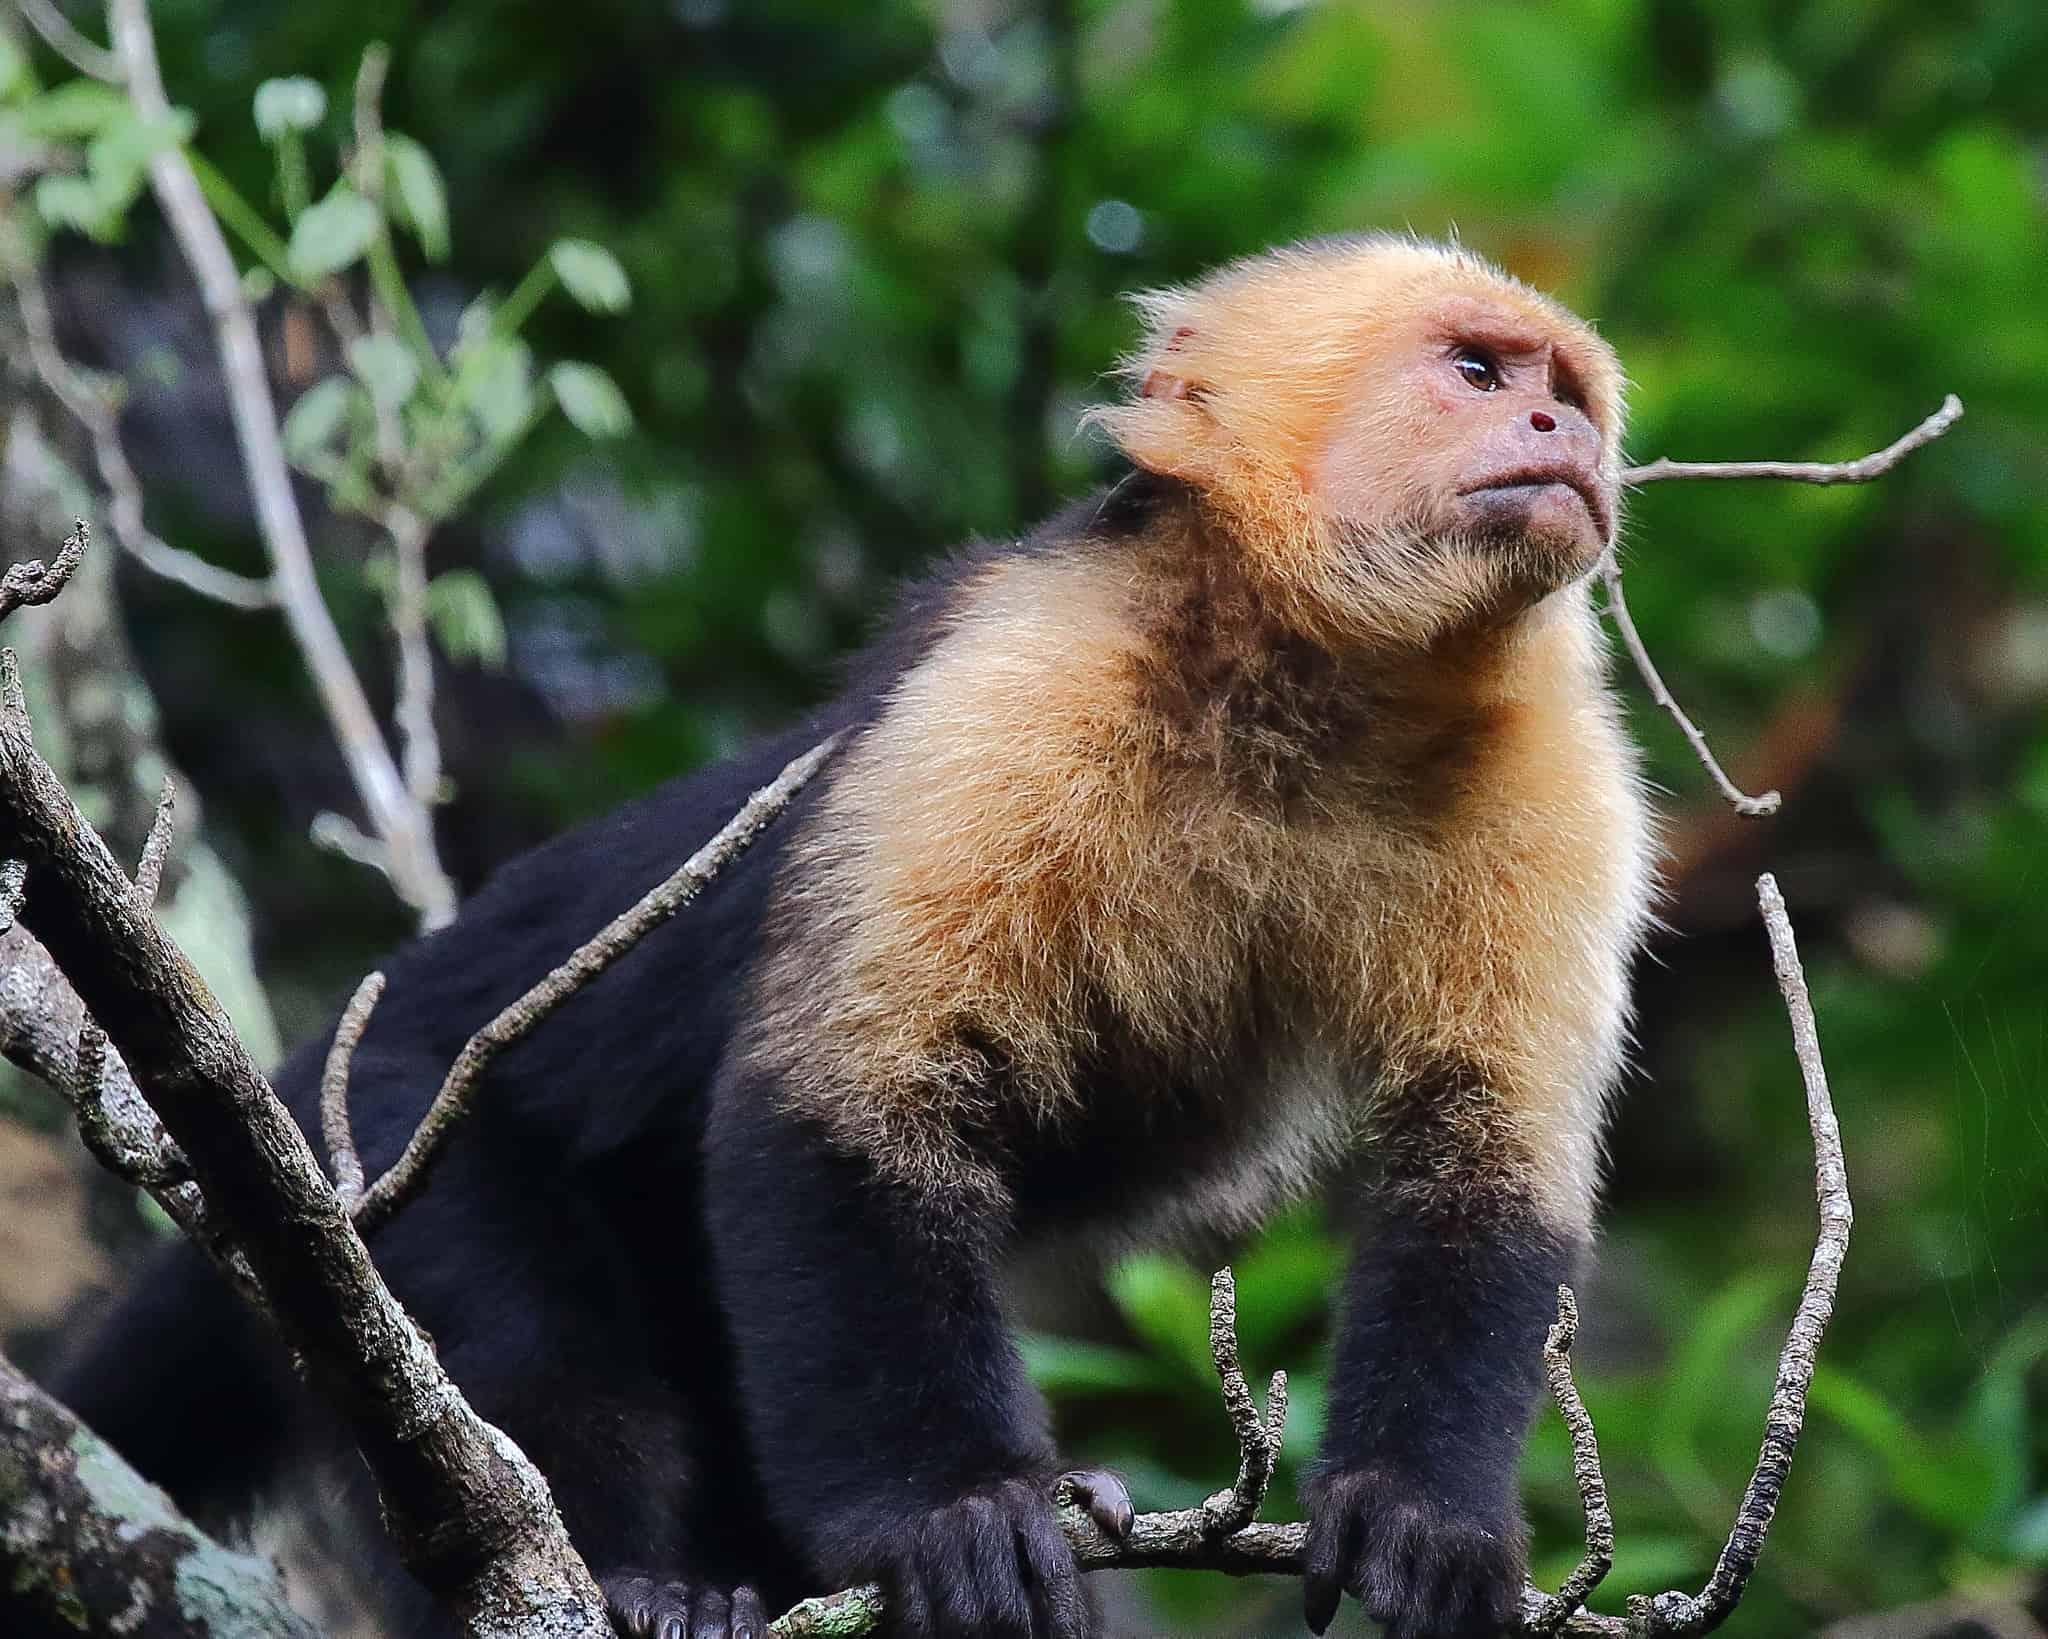 White-faced Capuchin Monkey, monkey facts